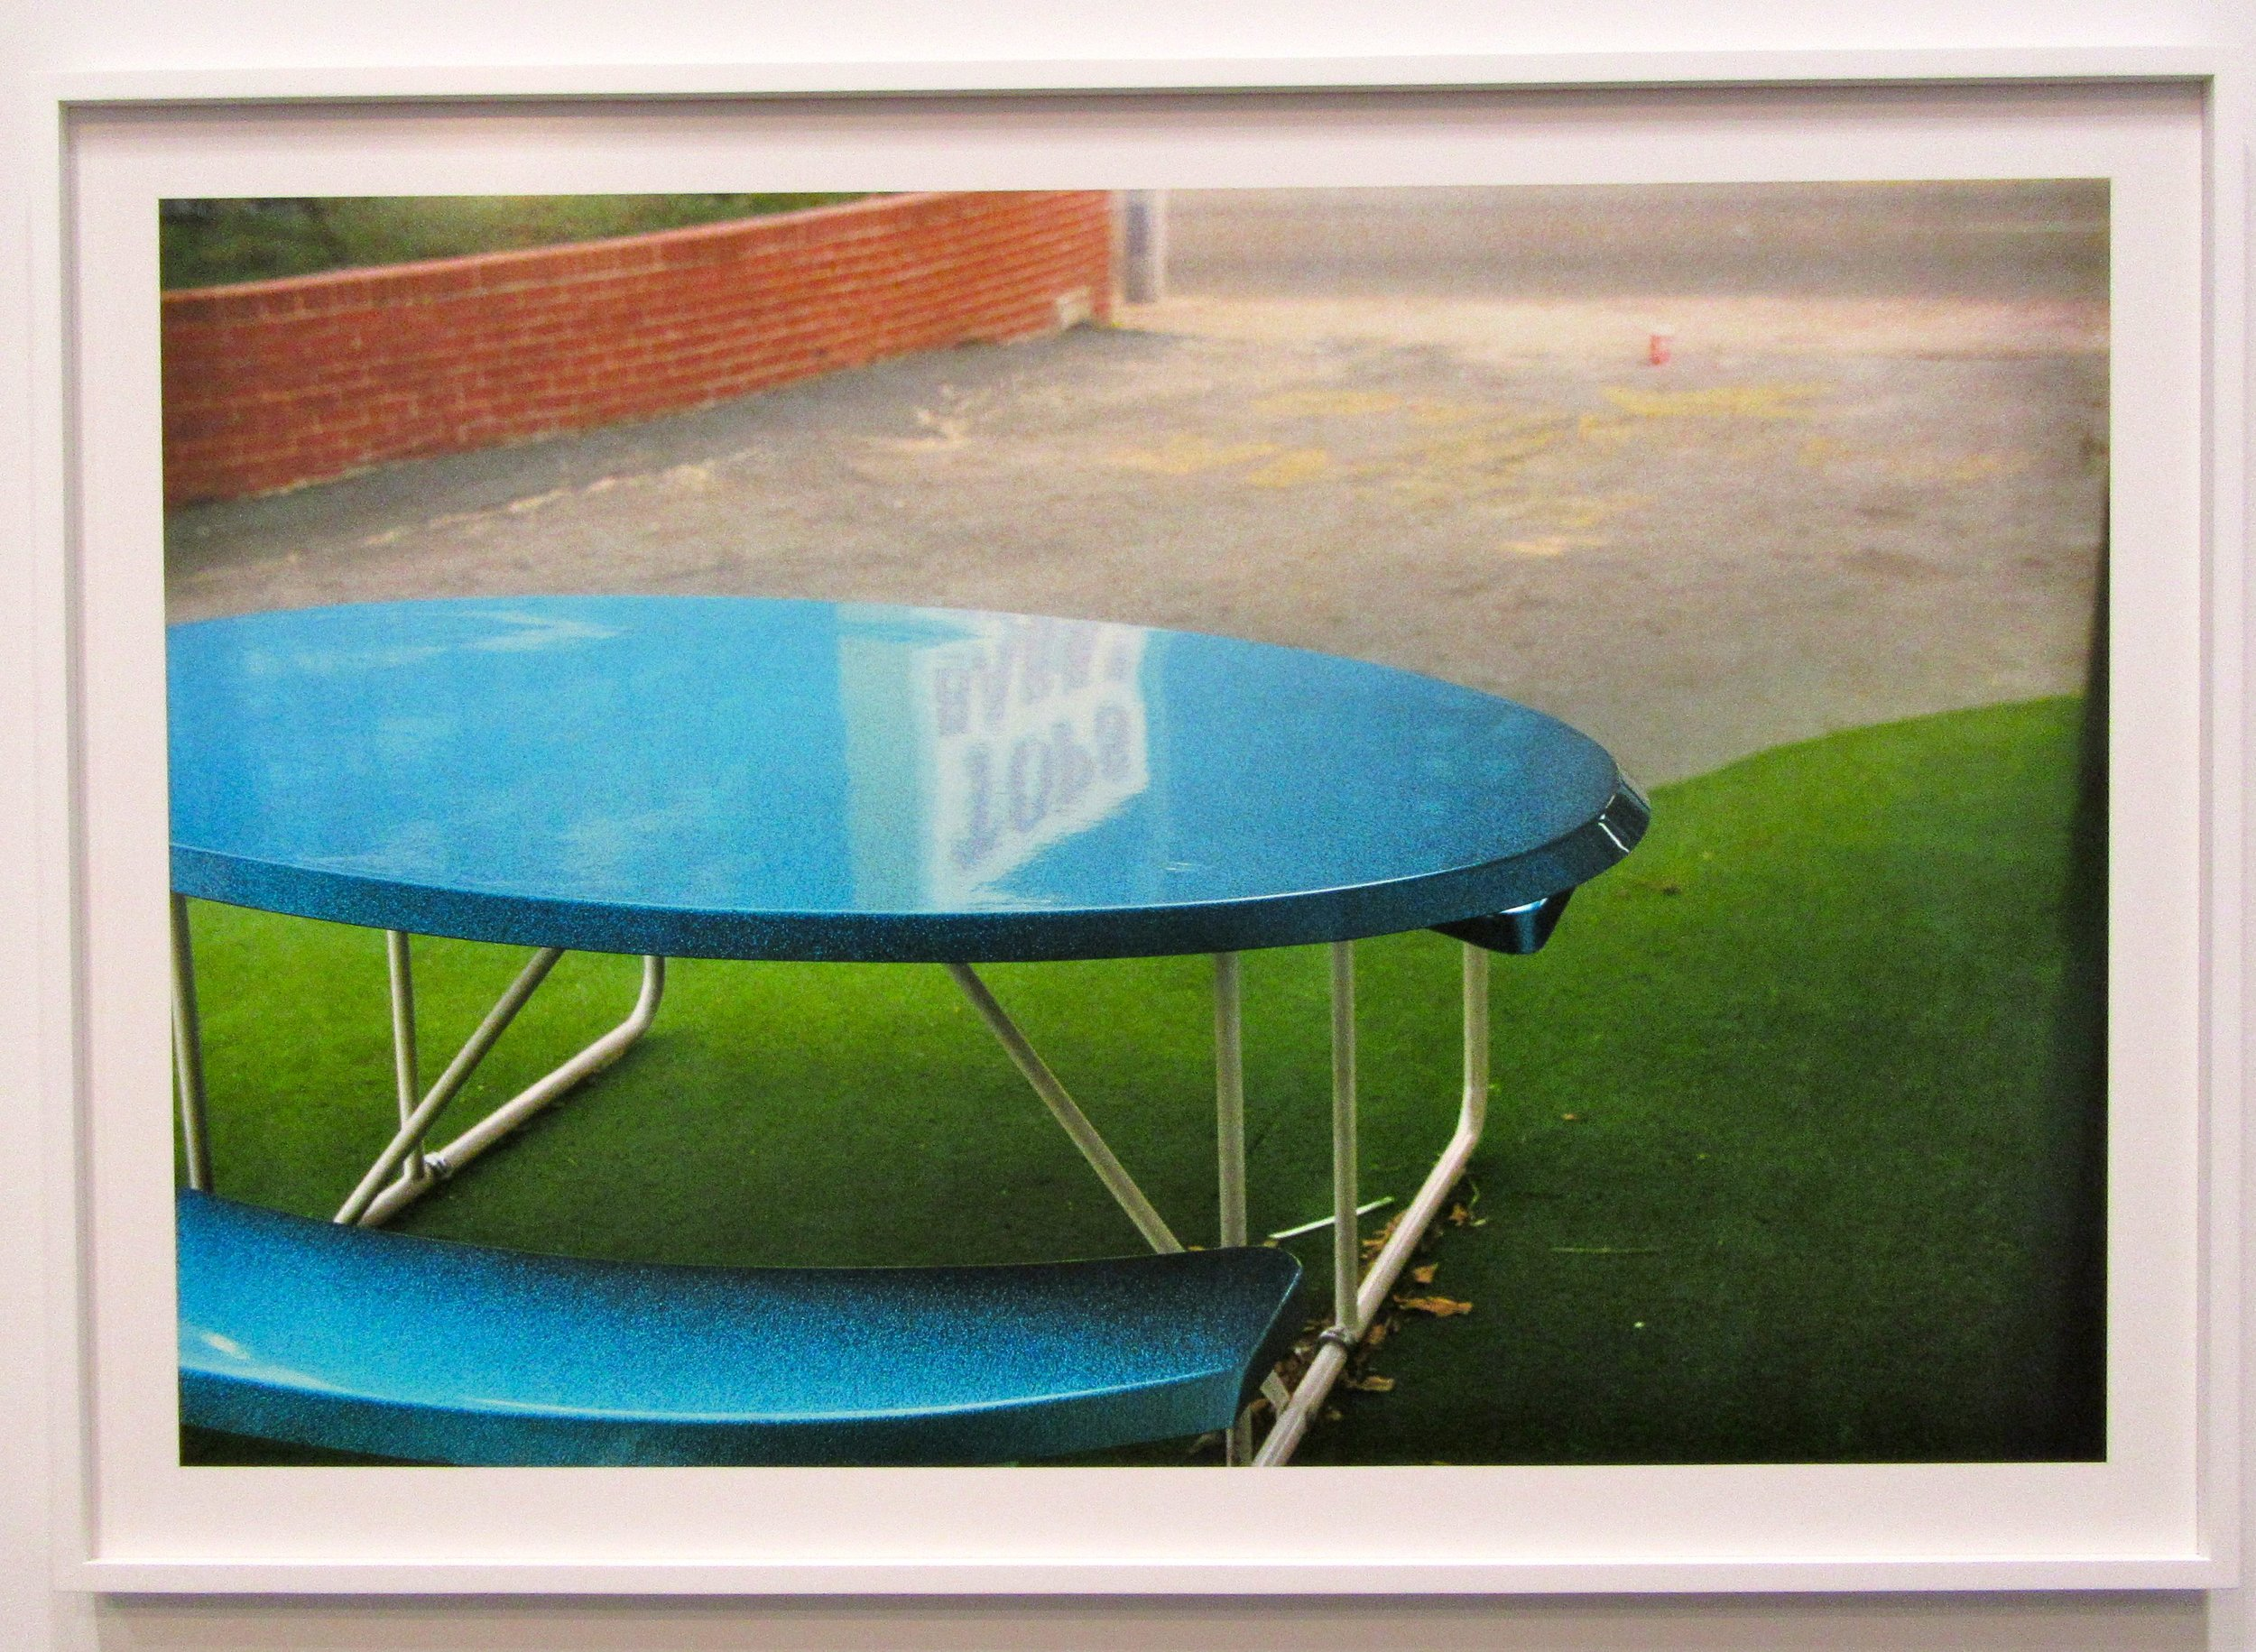 photographersbooks-william-egglestone-45.JPG